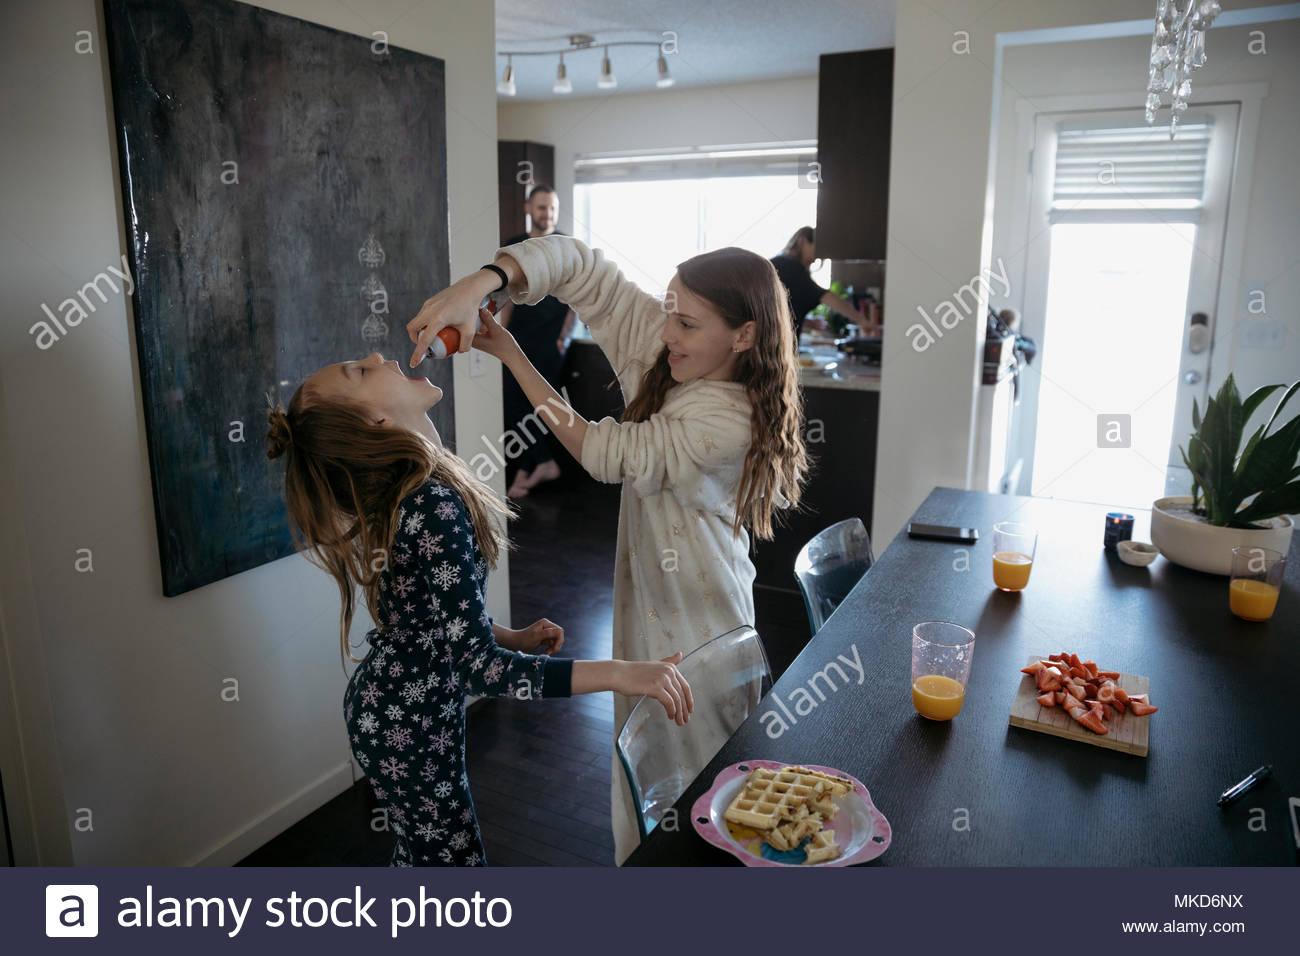 Playful sisters in pajamas enjoying spray whip cream at dining table - Stock Image